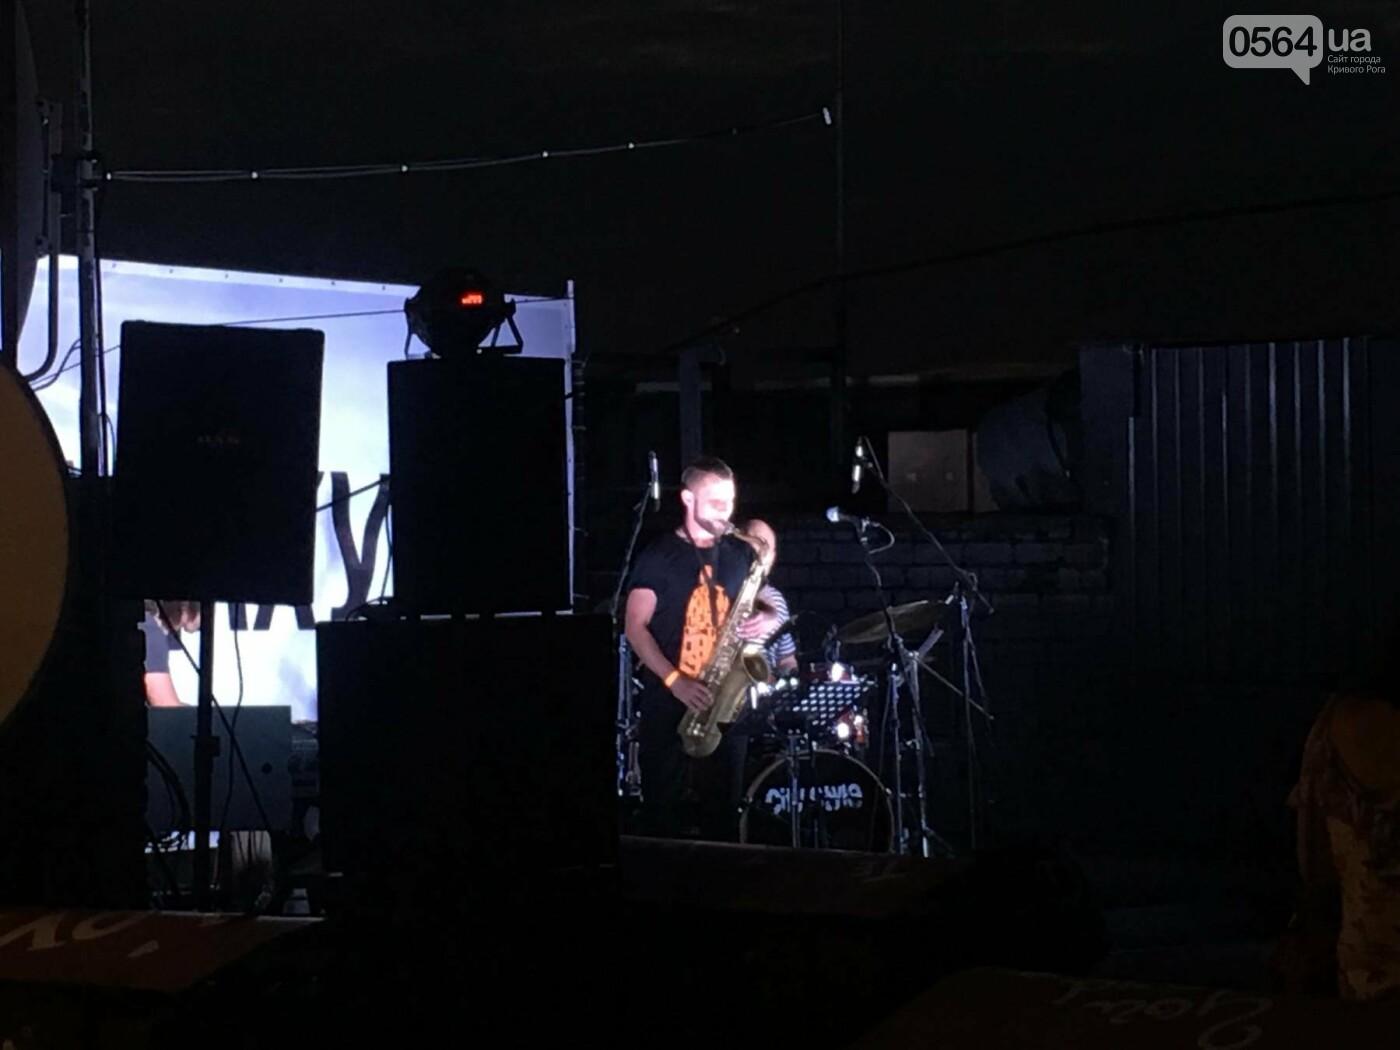 Сотни криворожан встречали закат на крыше отеля под мелодии джаза, - ФОТО, ВИДЕО, фото-2